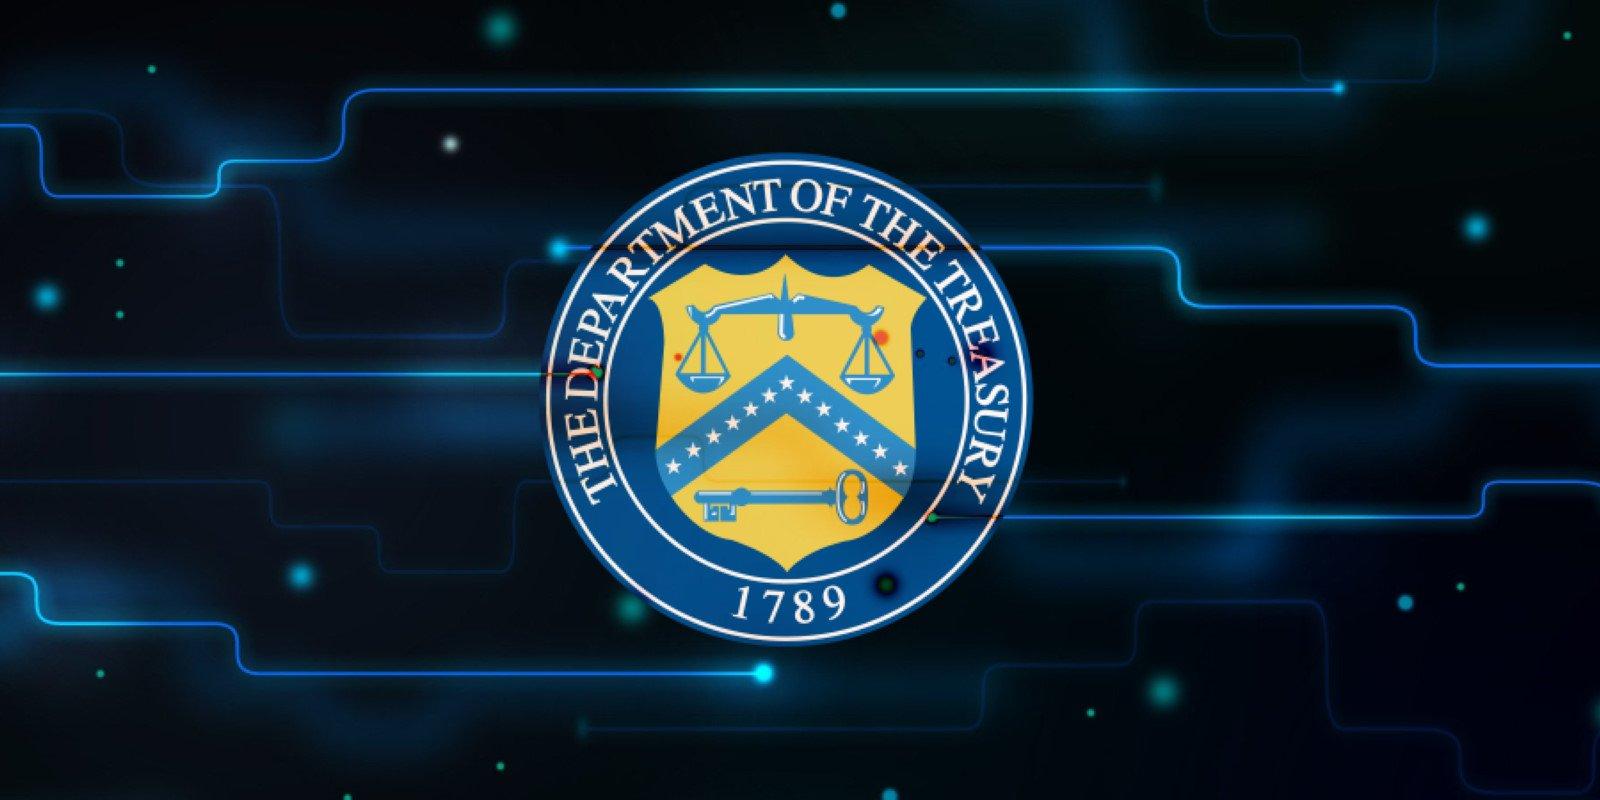 US govt warns of sanction risks for facilitating ransomware payments